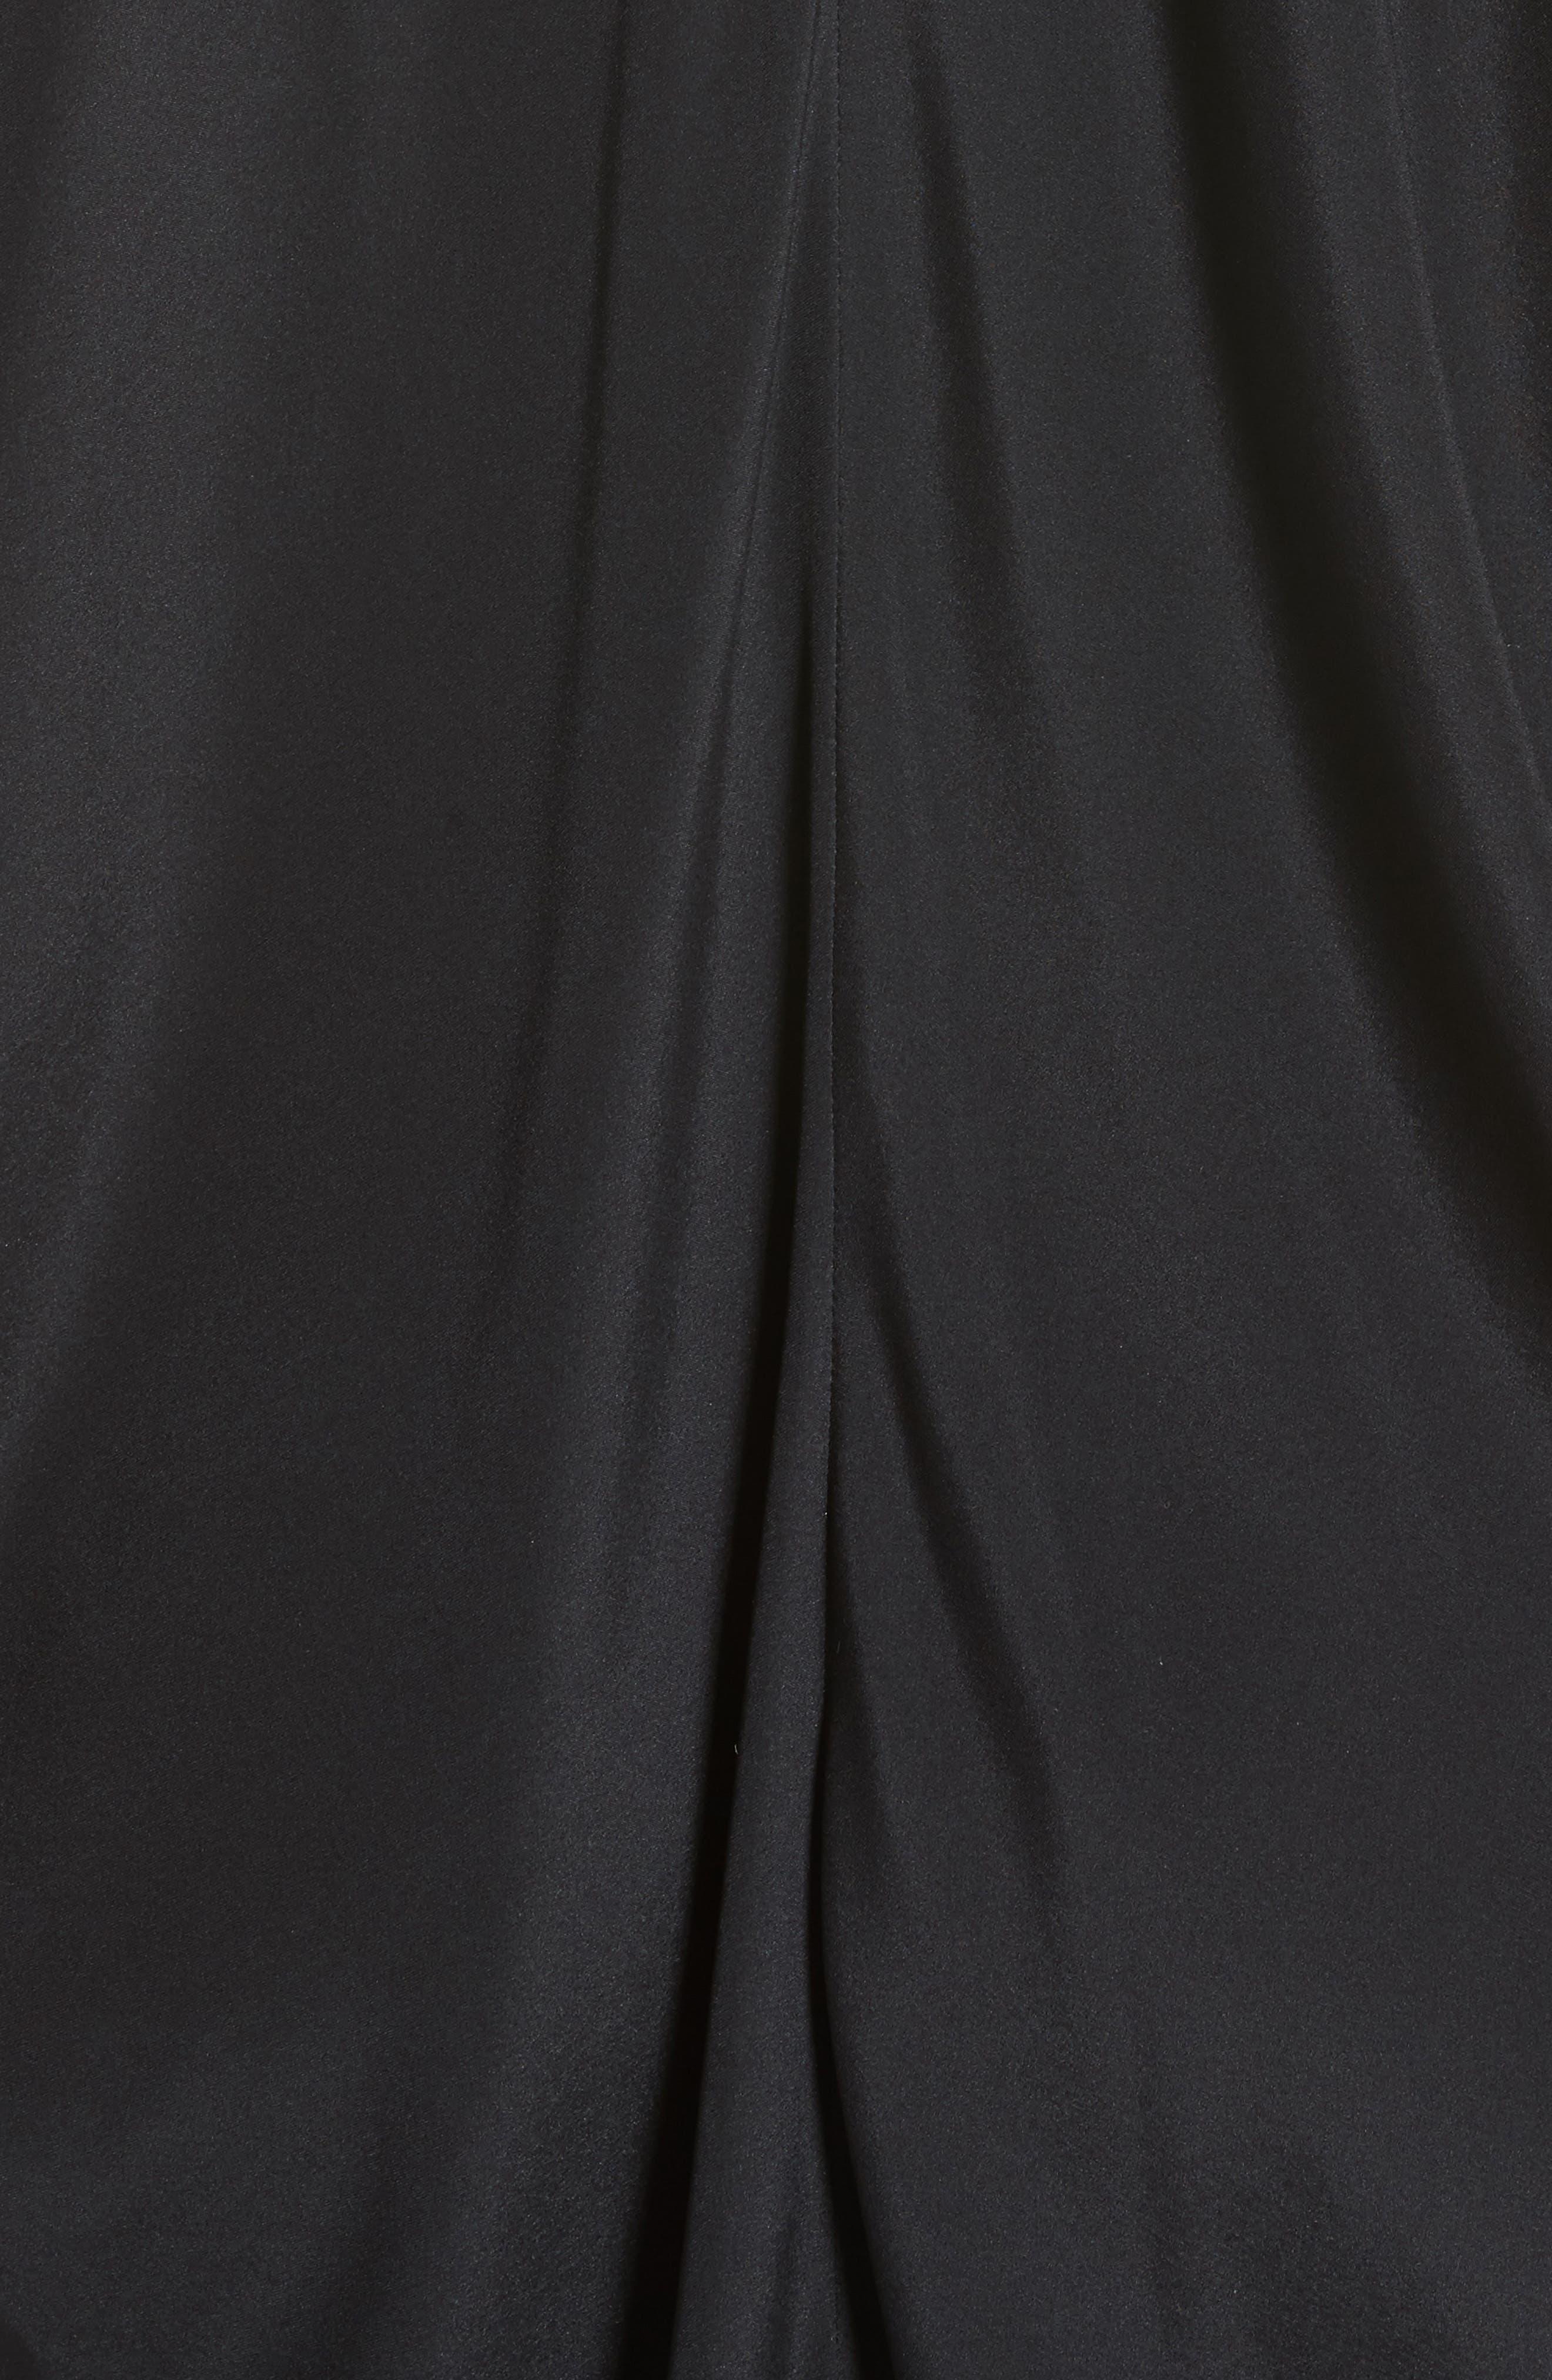 Koya Stretch Silk Charmeuse Dress,                             Alternate thumbnail 5, color,                             001